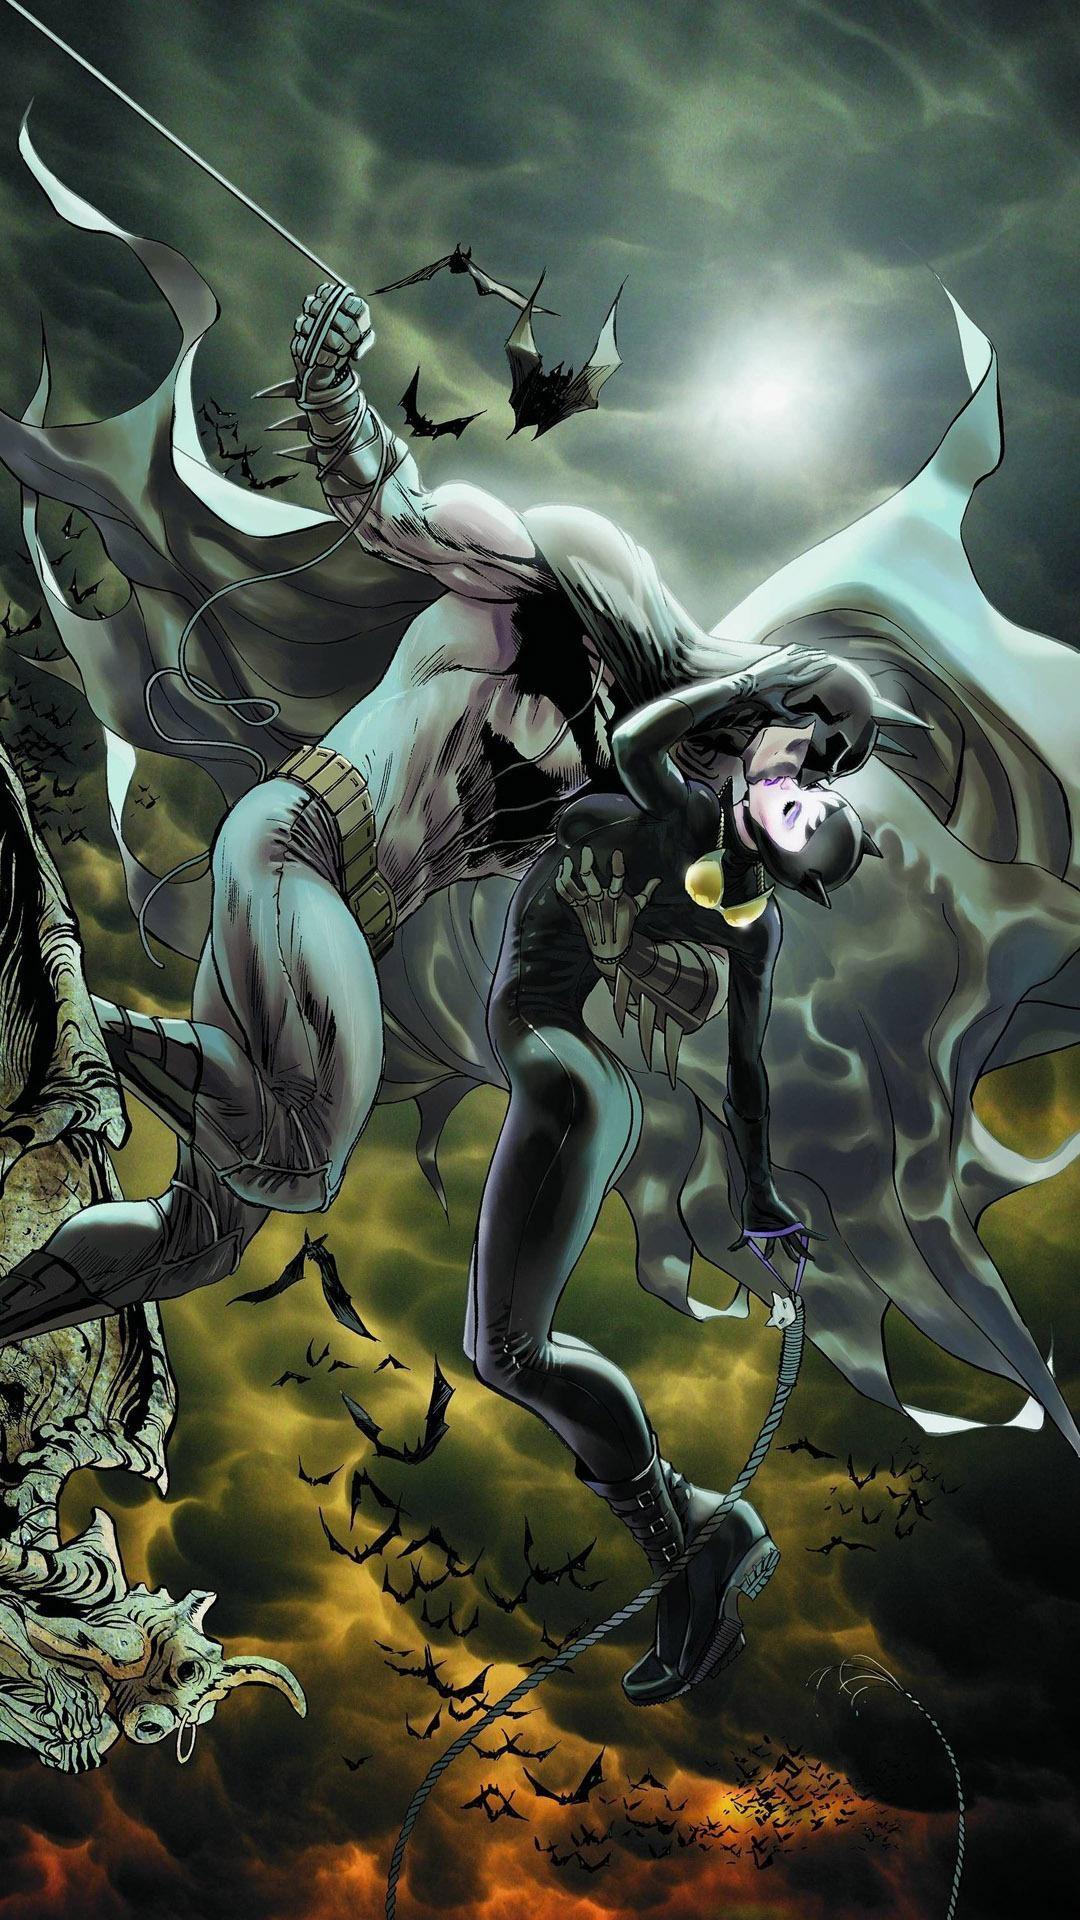 wallpaper.wiki-Dc-Comics-iPhone-Background-Widescreen-PIC-